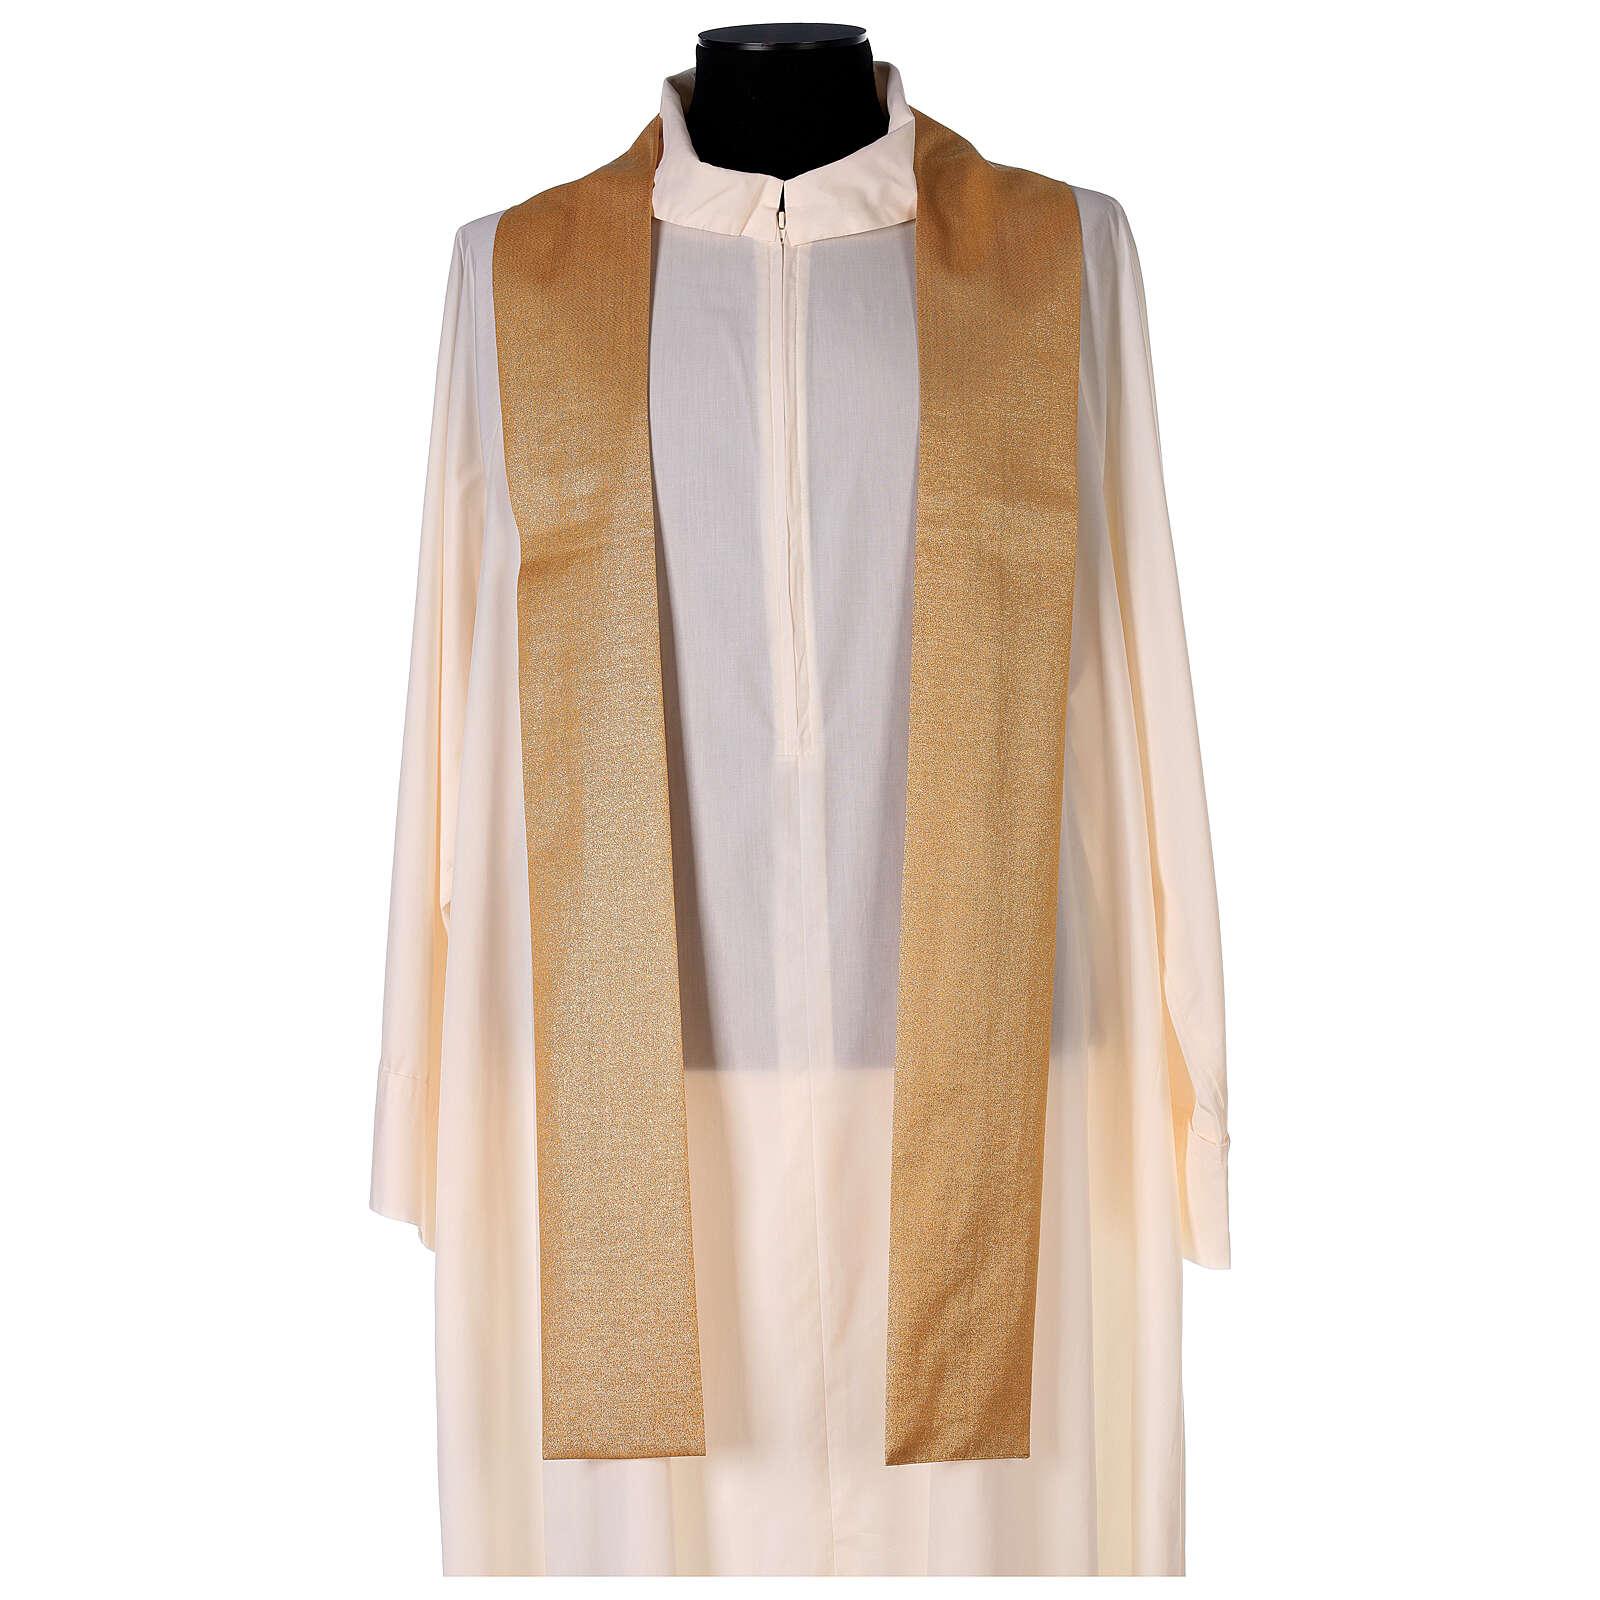 Chasuble dorée unie 100% polyester simple 4